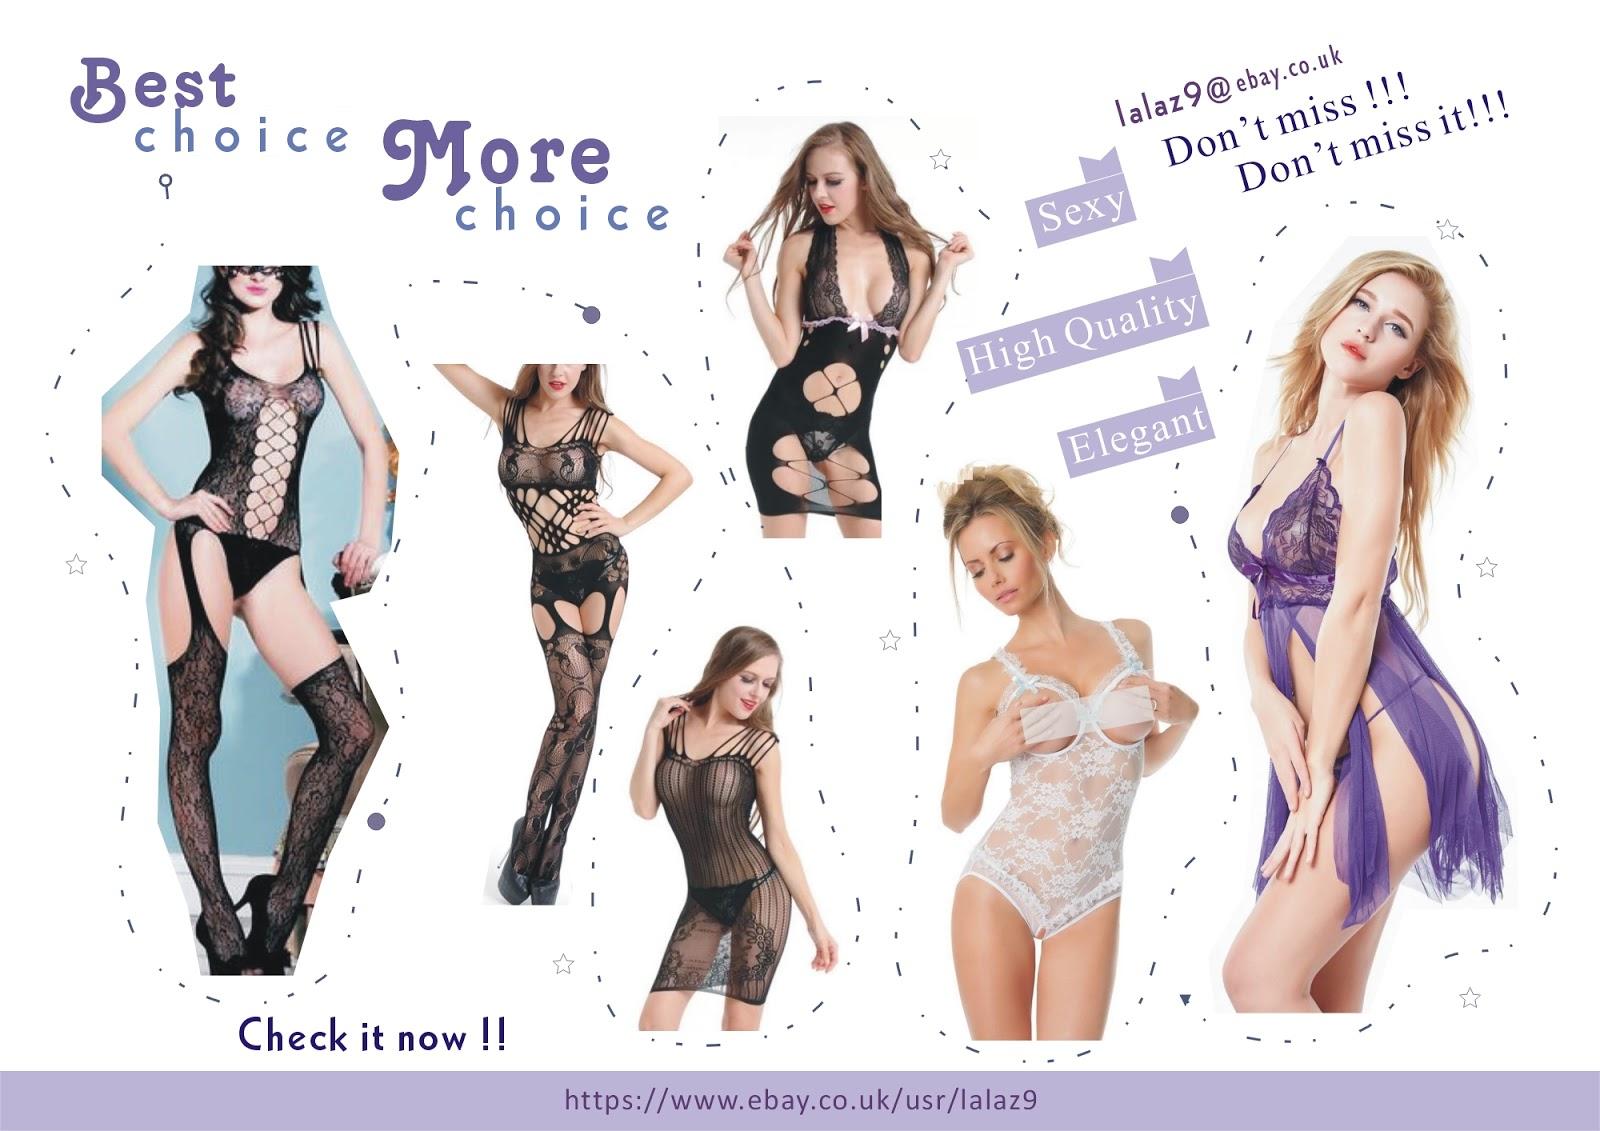 65chiayee 我有我态度之乱乱煮画计绪写 Ads Sexy Bodystocking Lingerie Dress Ebay Co Uk Lalaz9